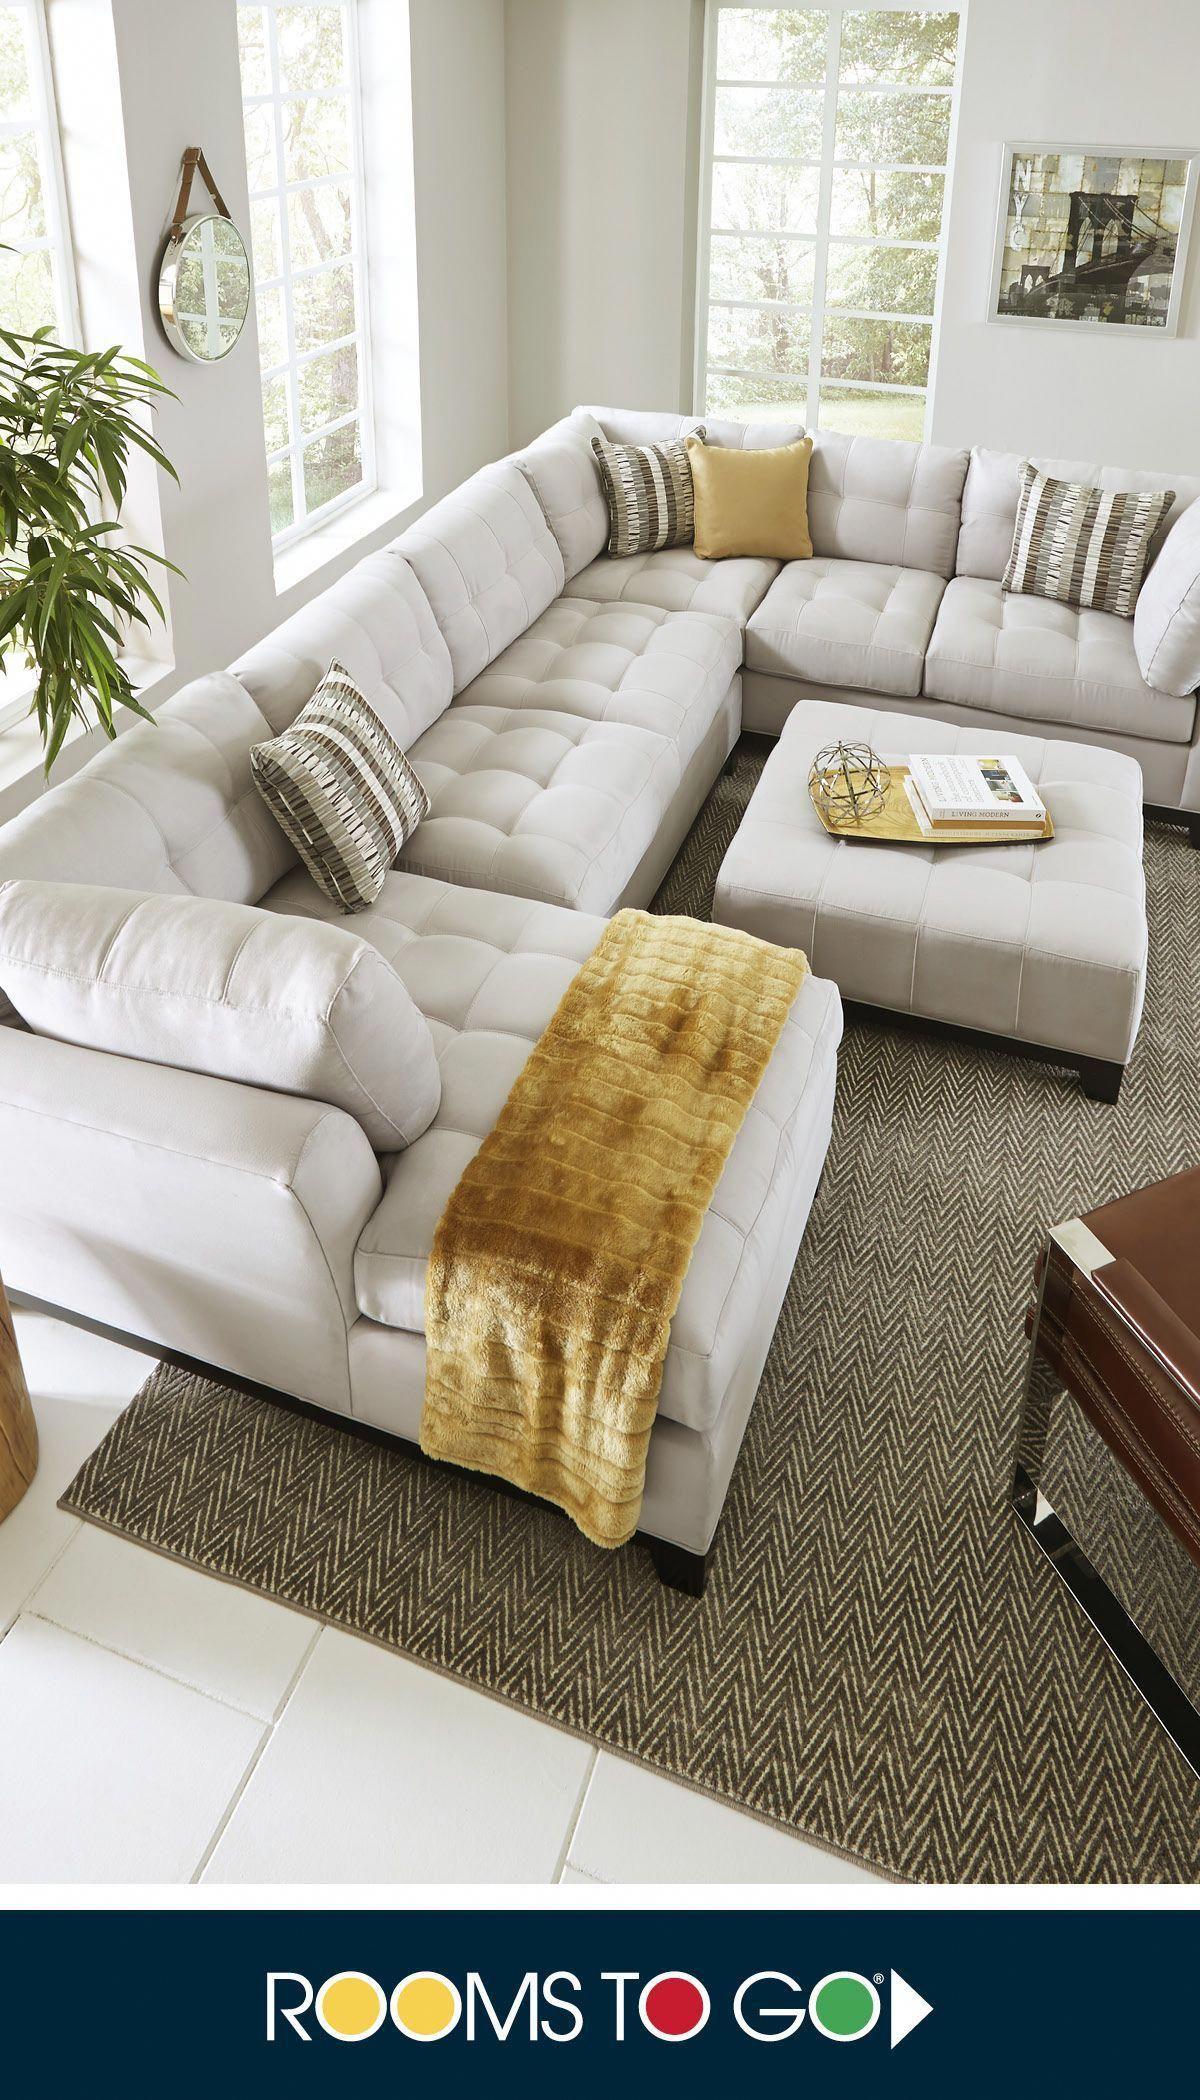 Virtual Design Living Room: Good Virtual Family 2 Room Ideas #familyroomideas